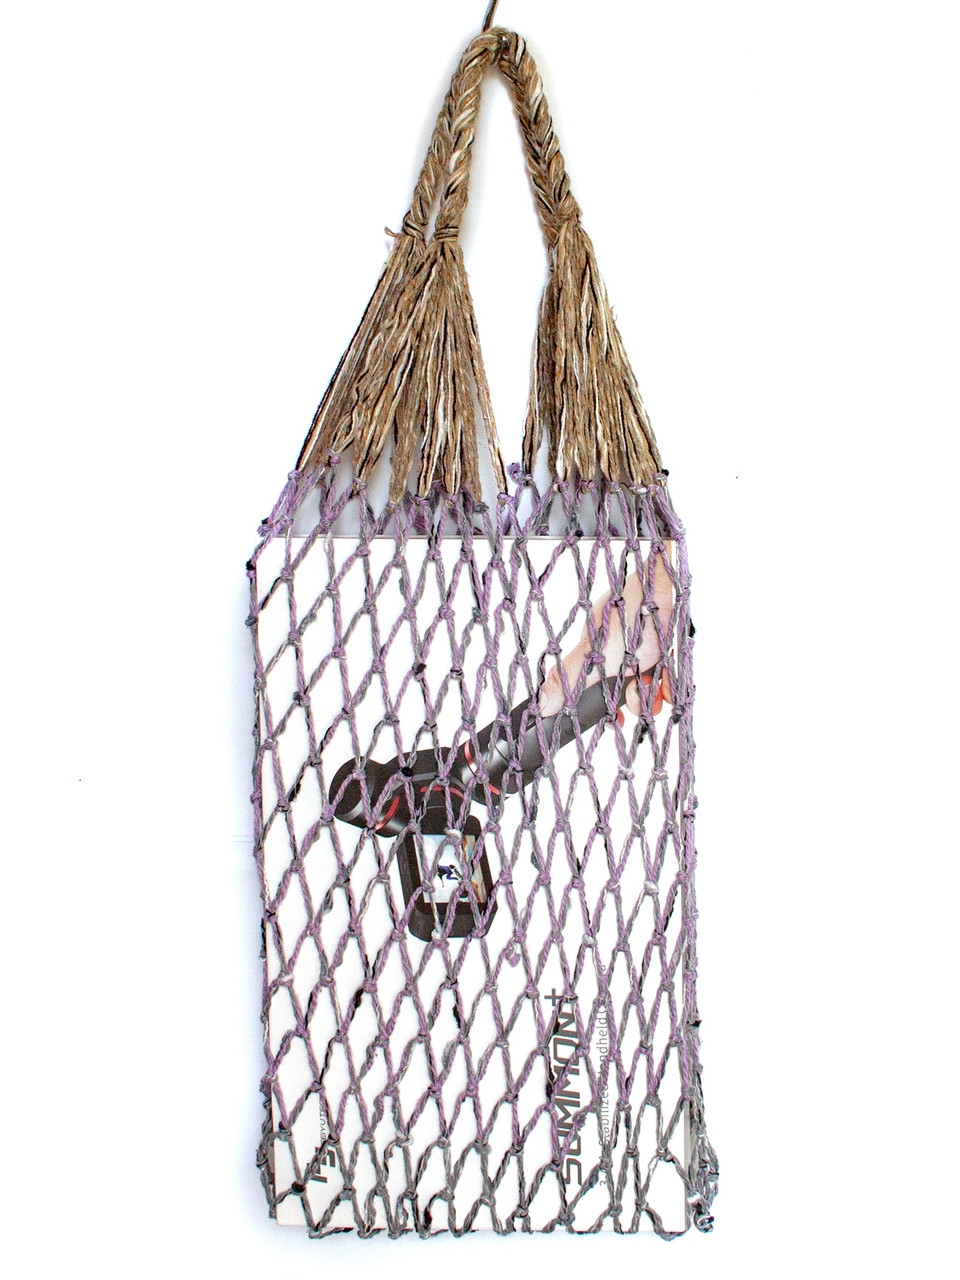 Шопер сумка - Эко сумка - Авоська -  Эксклюзивная сумка